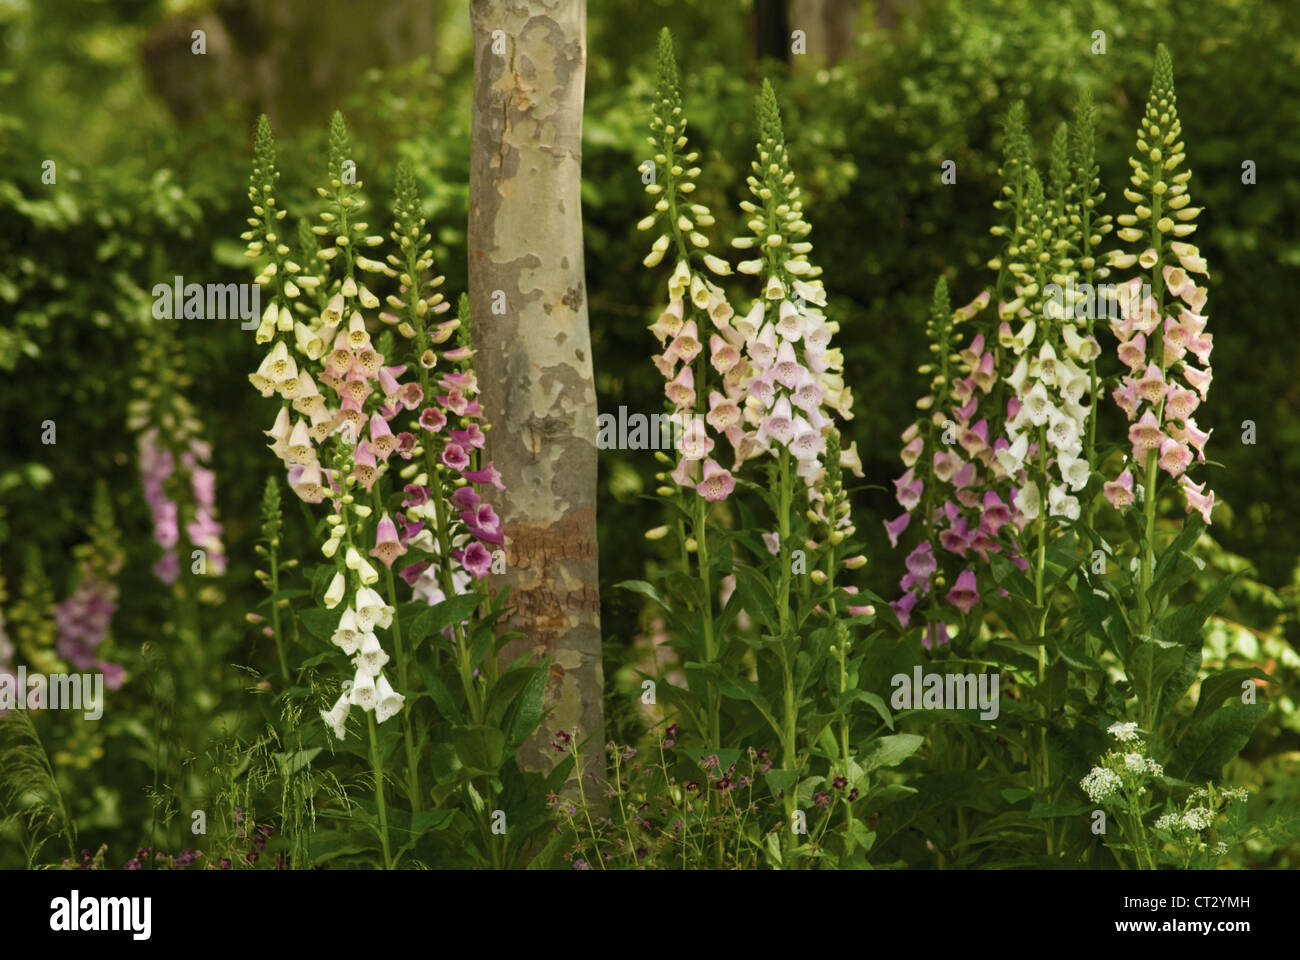 Digitalis purpurea, Foxglove - Stock Image